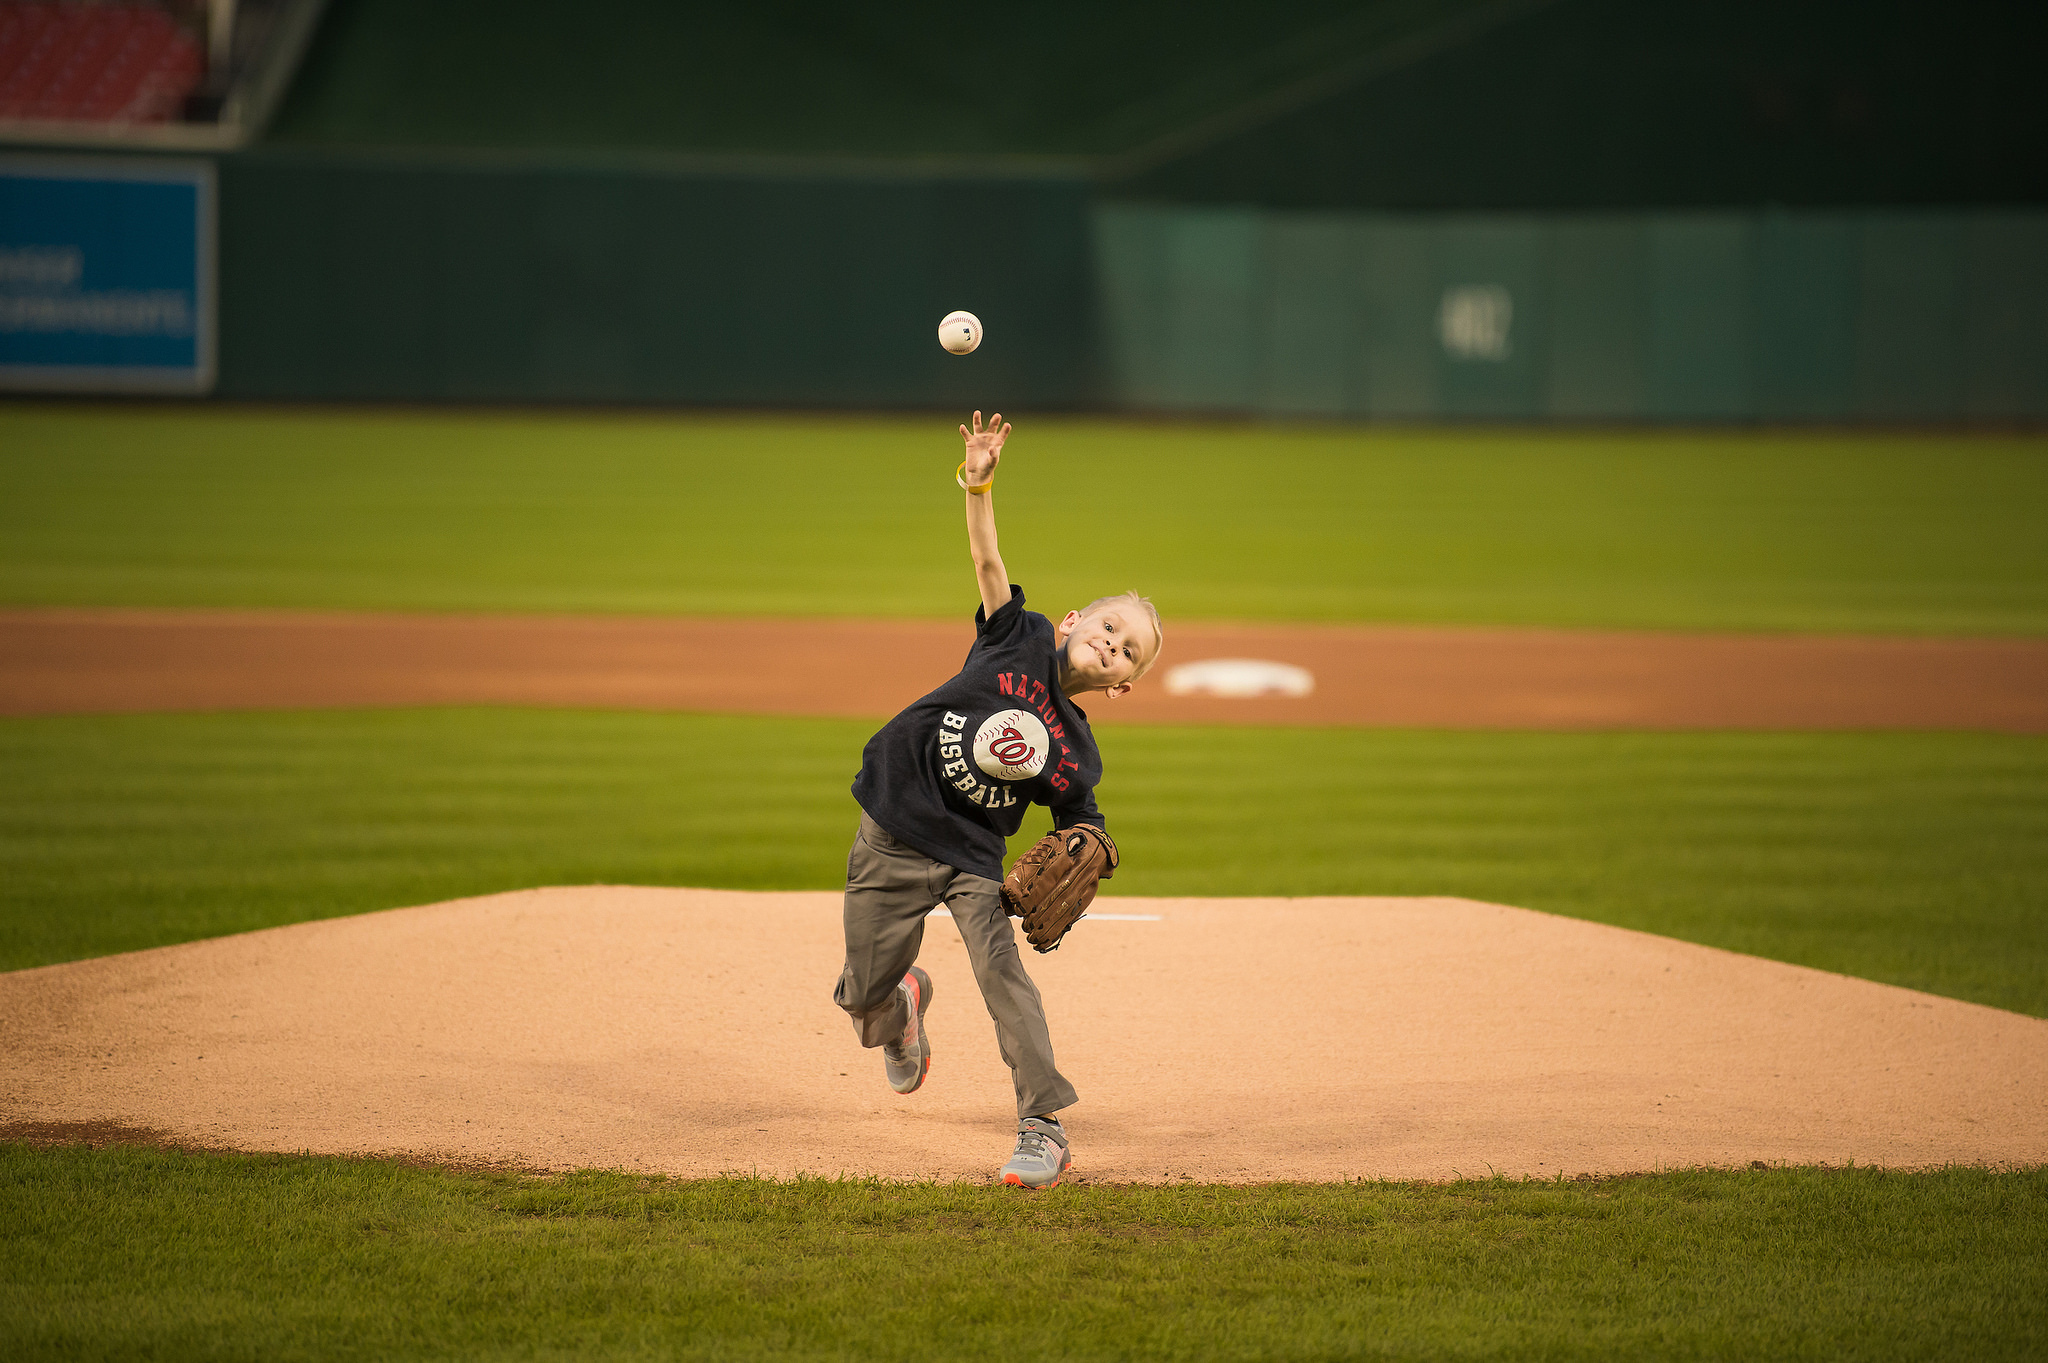 Abram throwing first pitch